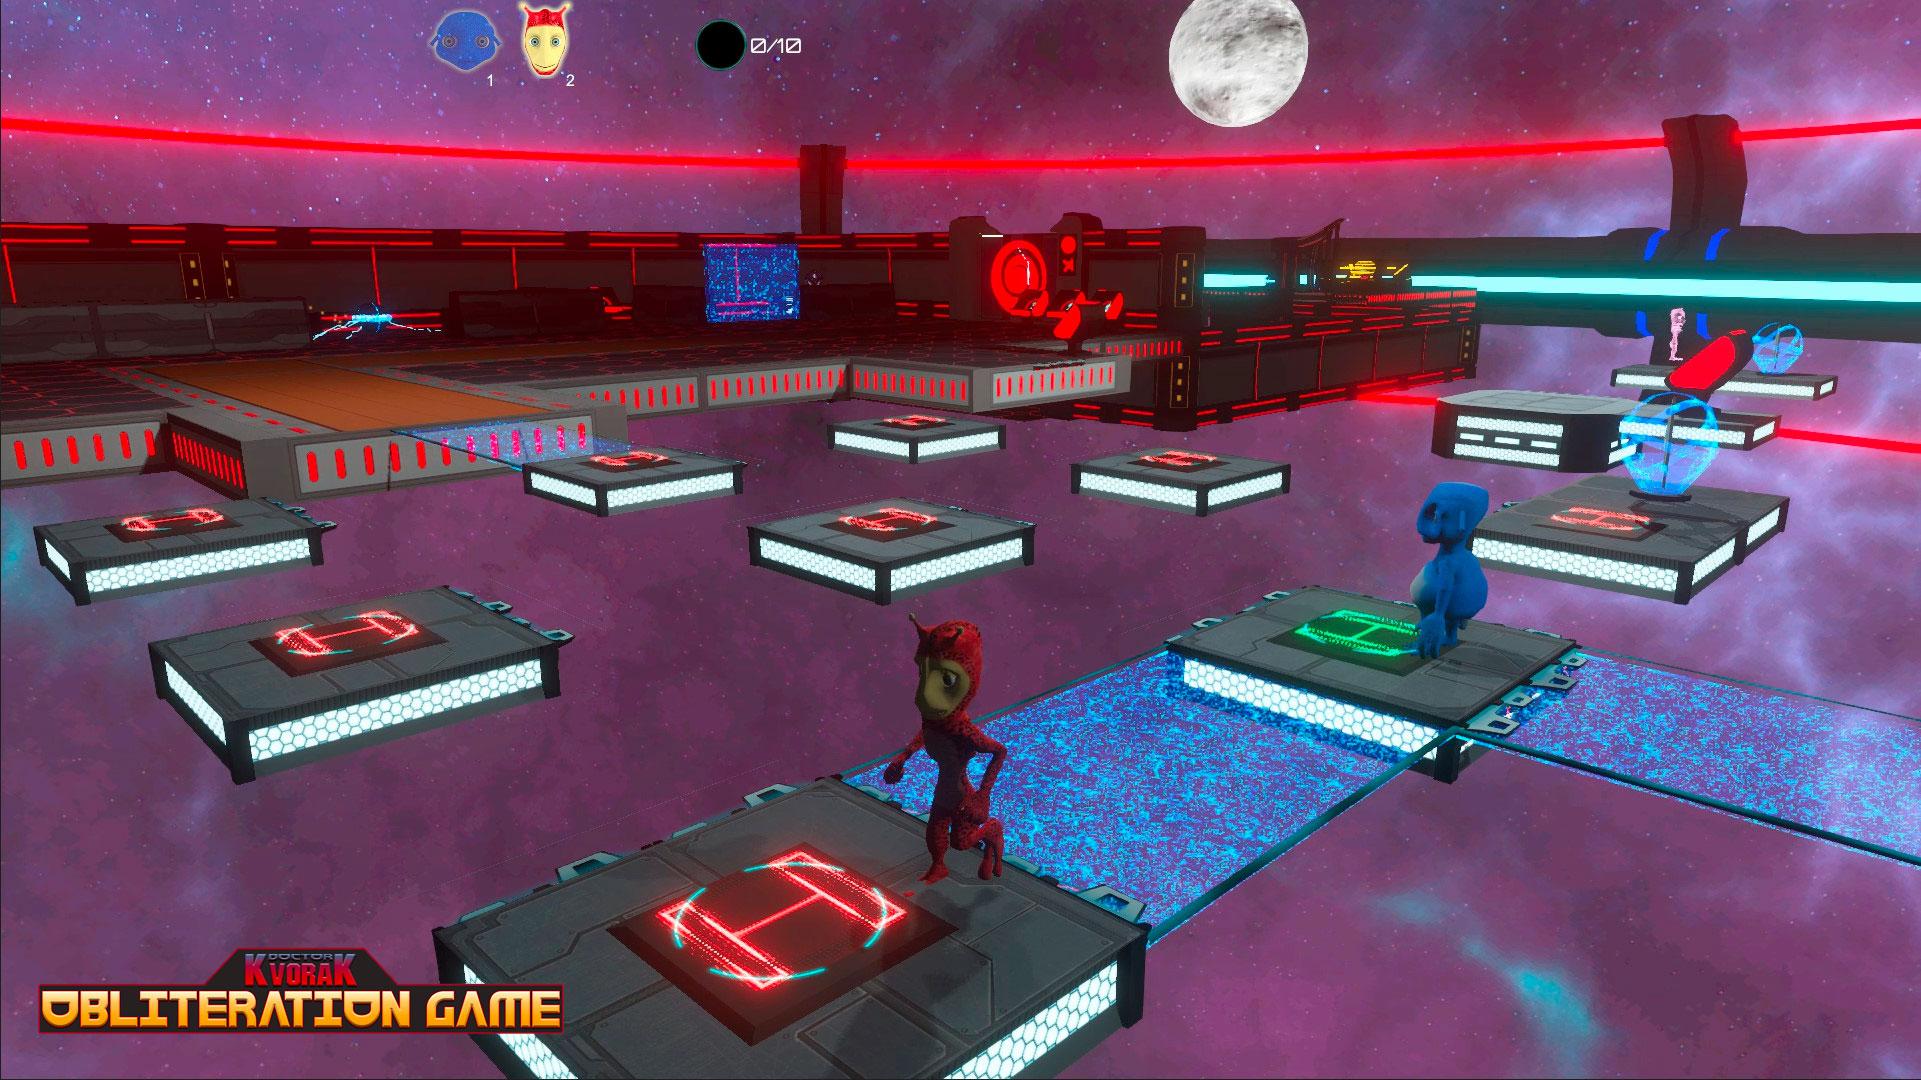 Obliteration Game Gameplay